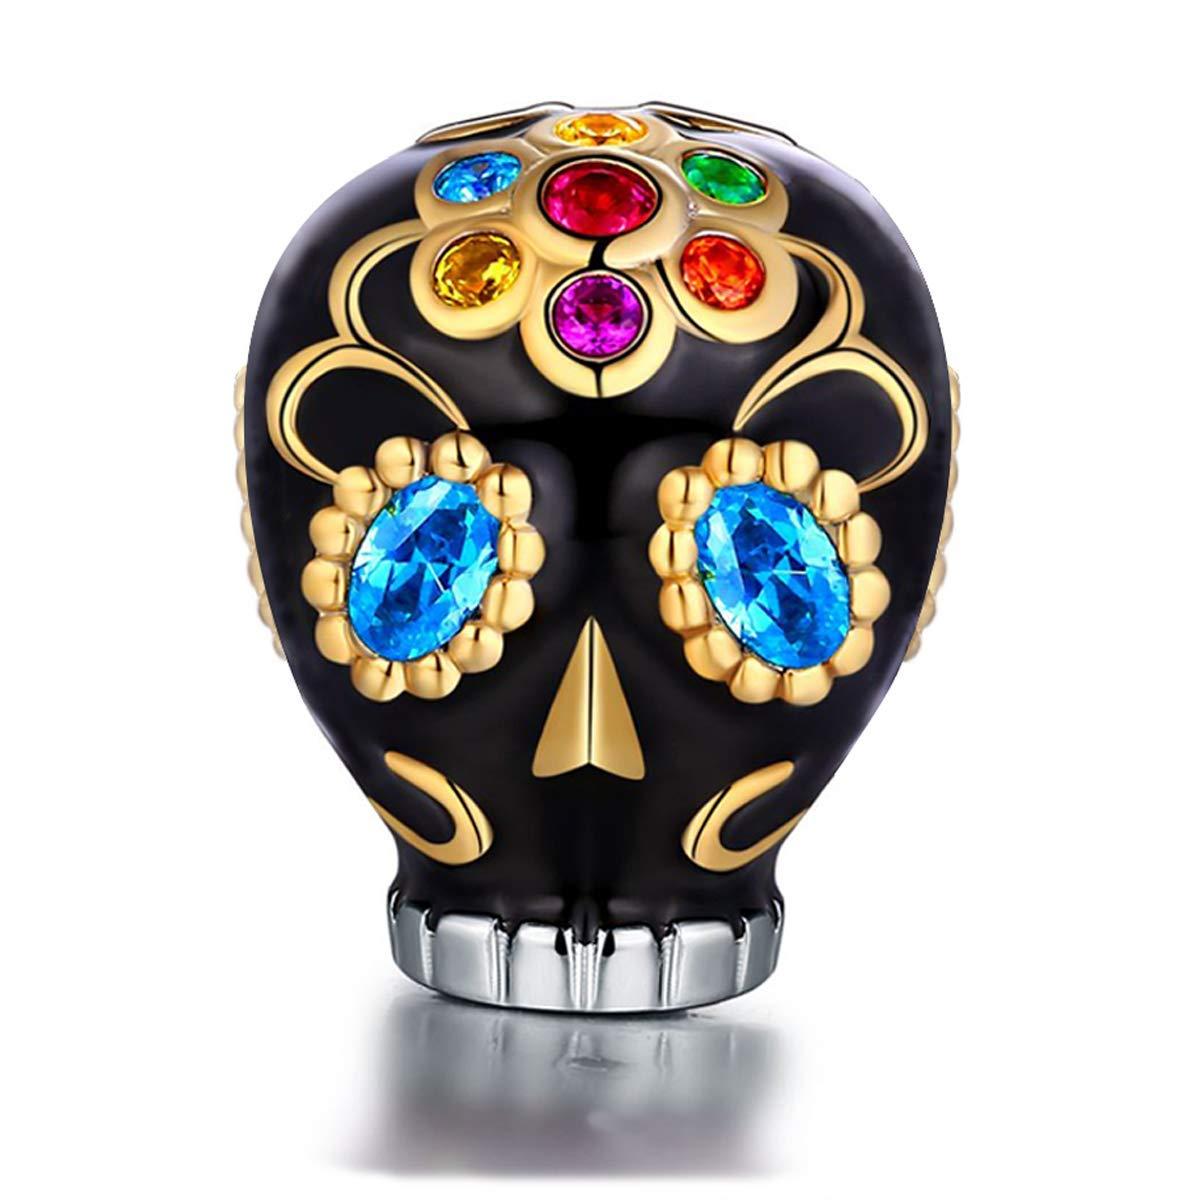 FOREVER QUEEN Skull Charms fit Pandora Charms Bracelets, 925 Sterling Silver Sunflower Dia De Los Muertos Bead Multicolor CZ Charm for European Bracelets& Necklace, Best for Women Girls FQ0036